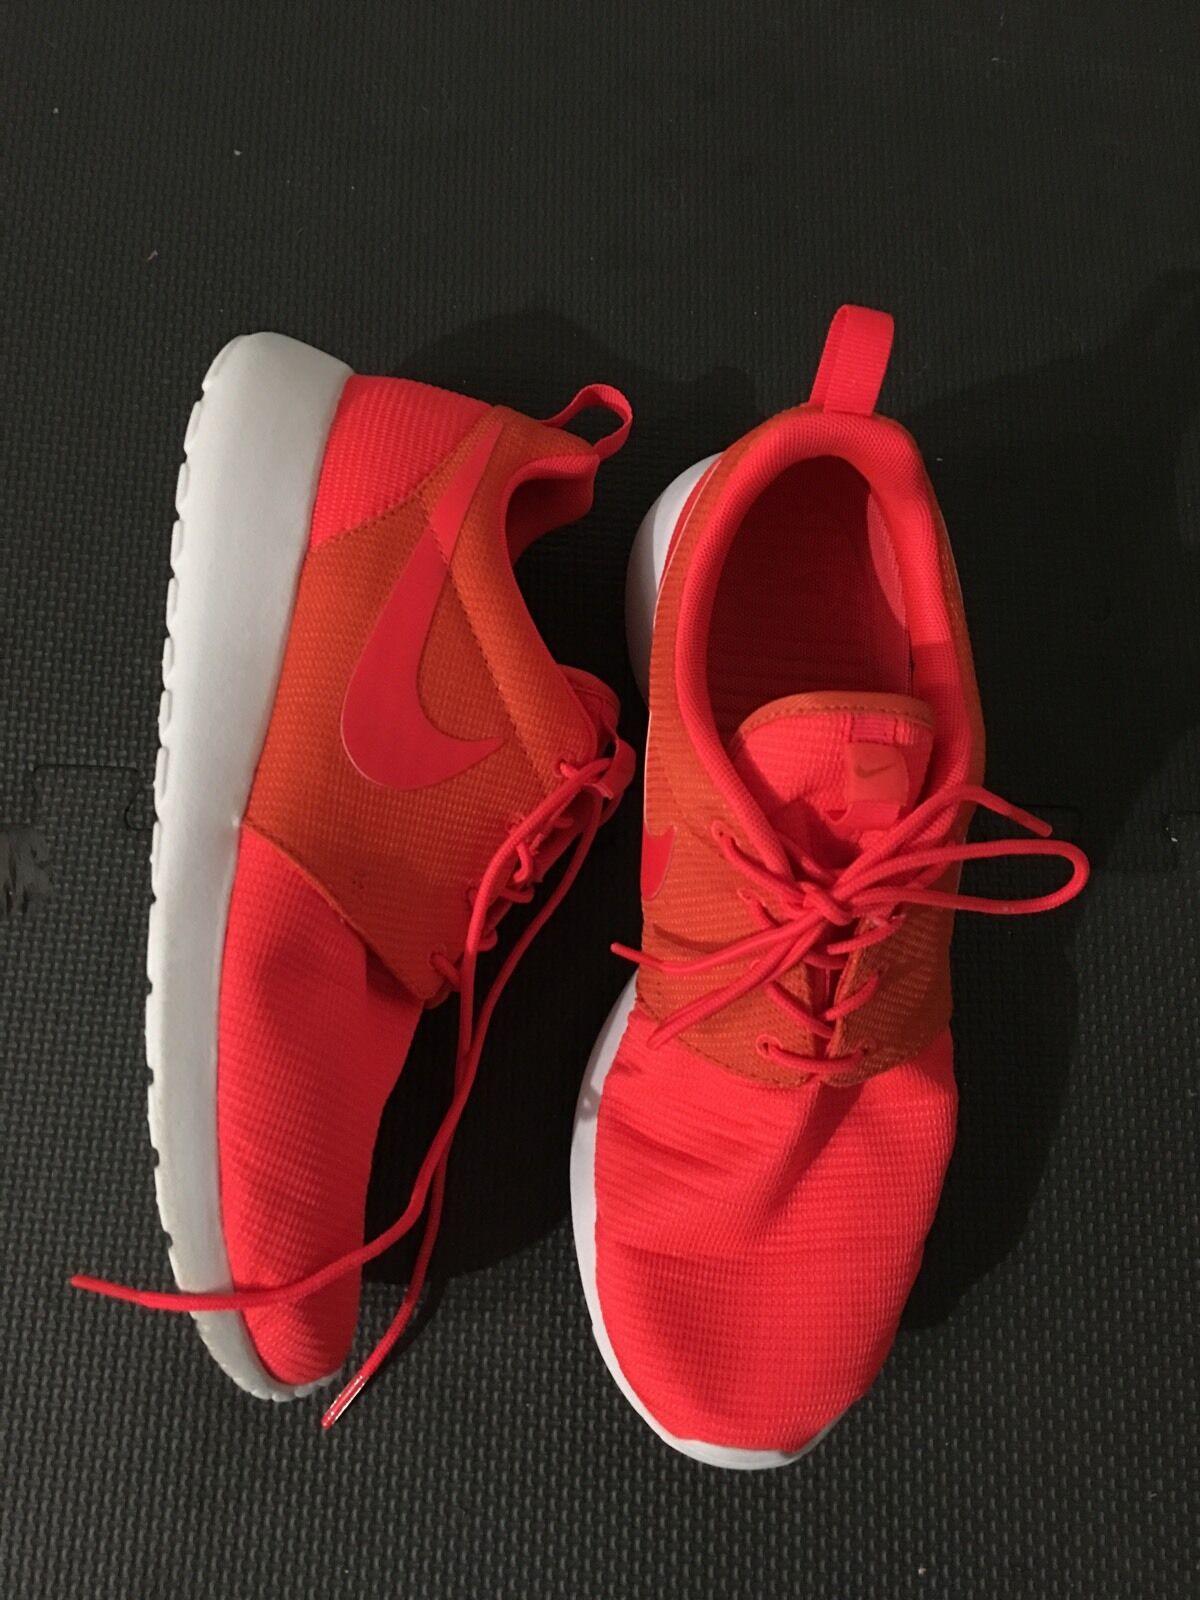 Nike Uomo Rosche Orange Sneaker, Size 9.5